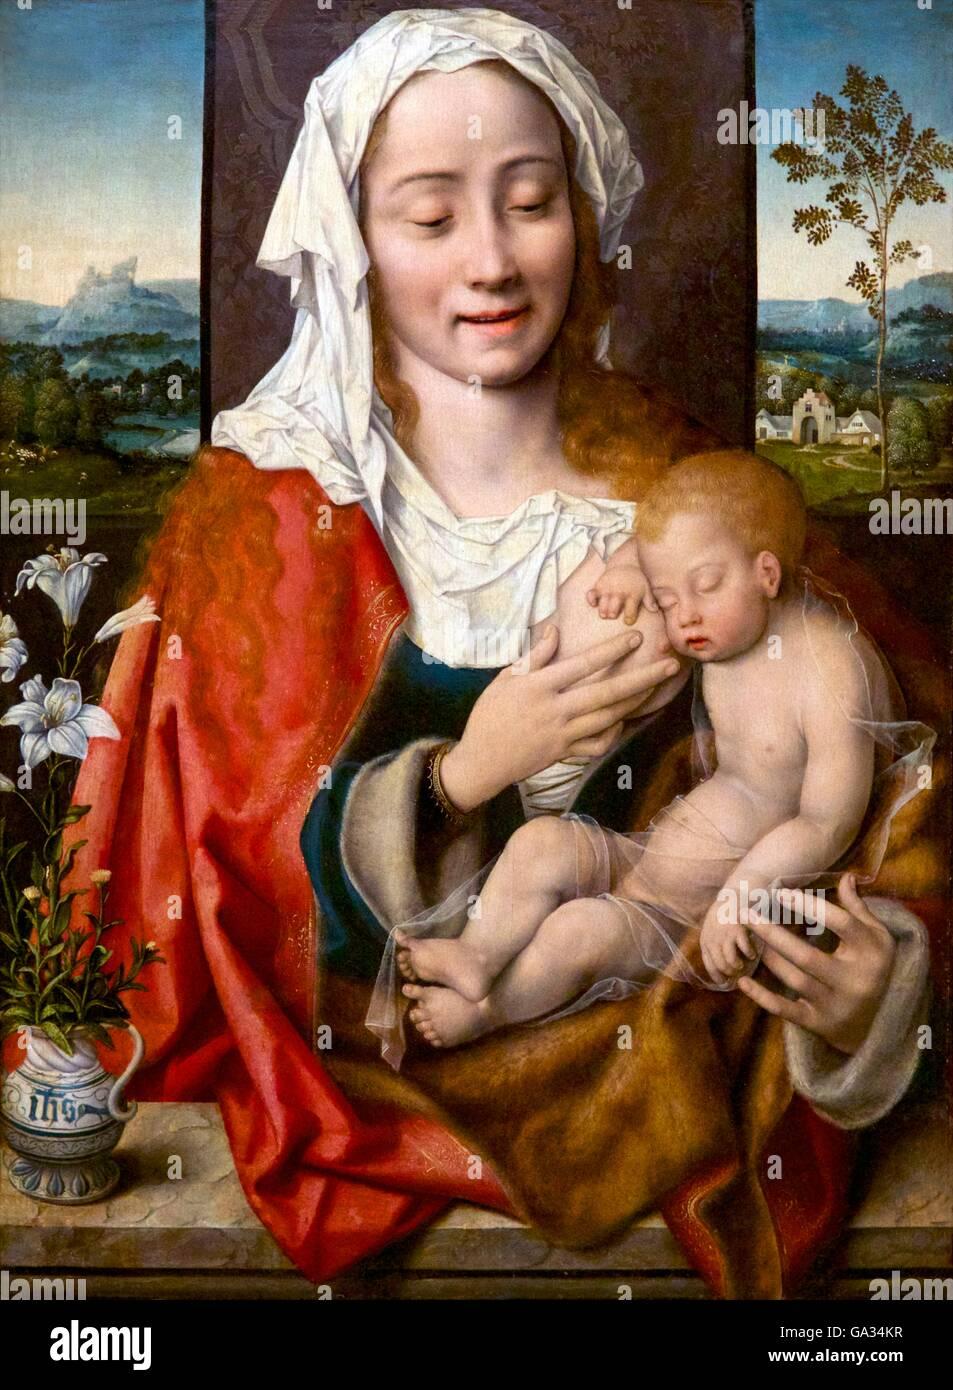 Jungfrau und Kind, Gemälde von Joos van Cleve, ca. 1525, Fitzwilliam Museum, Cambridge, England, UK, GB Stockbild